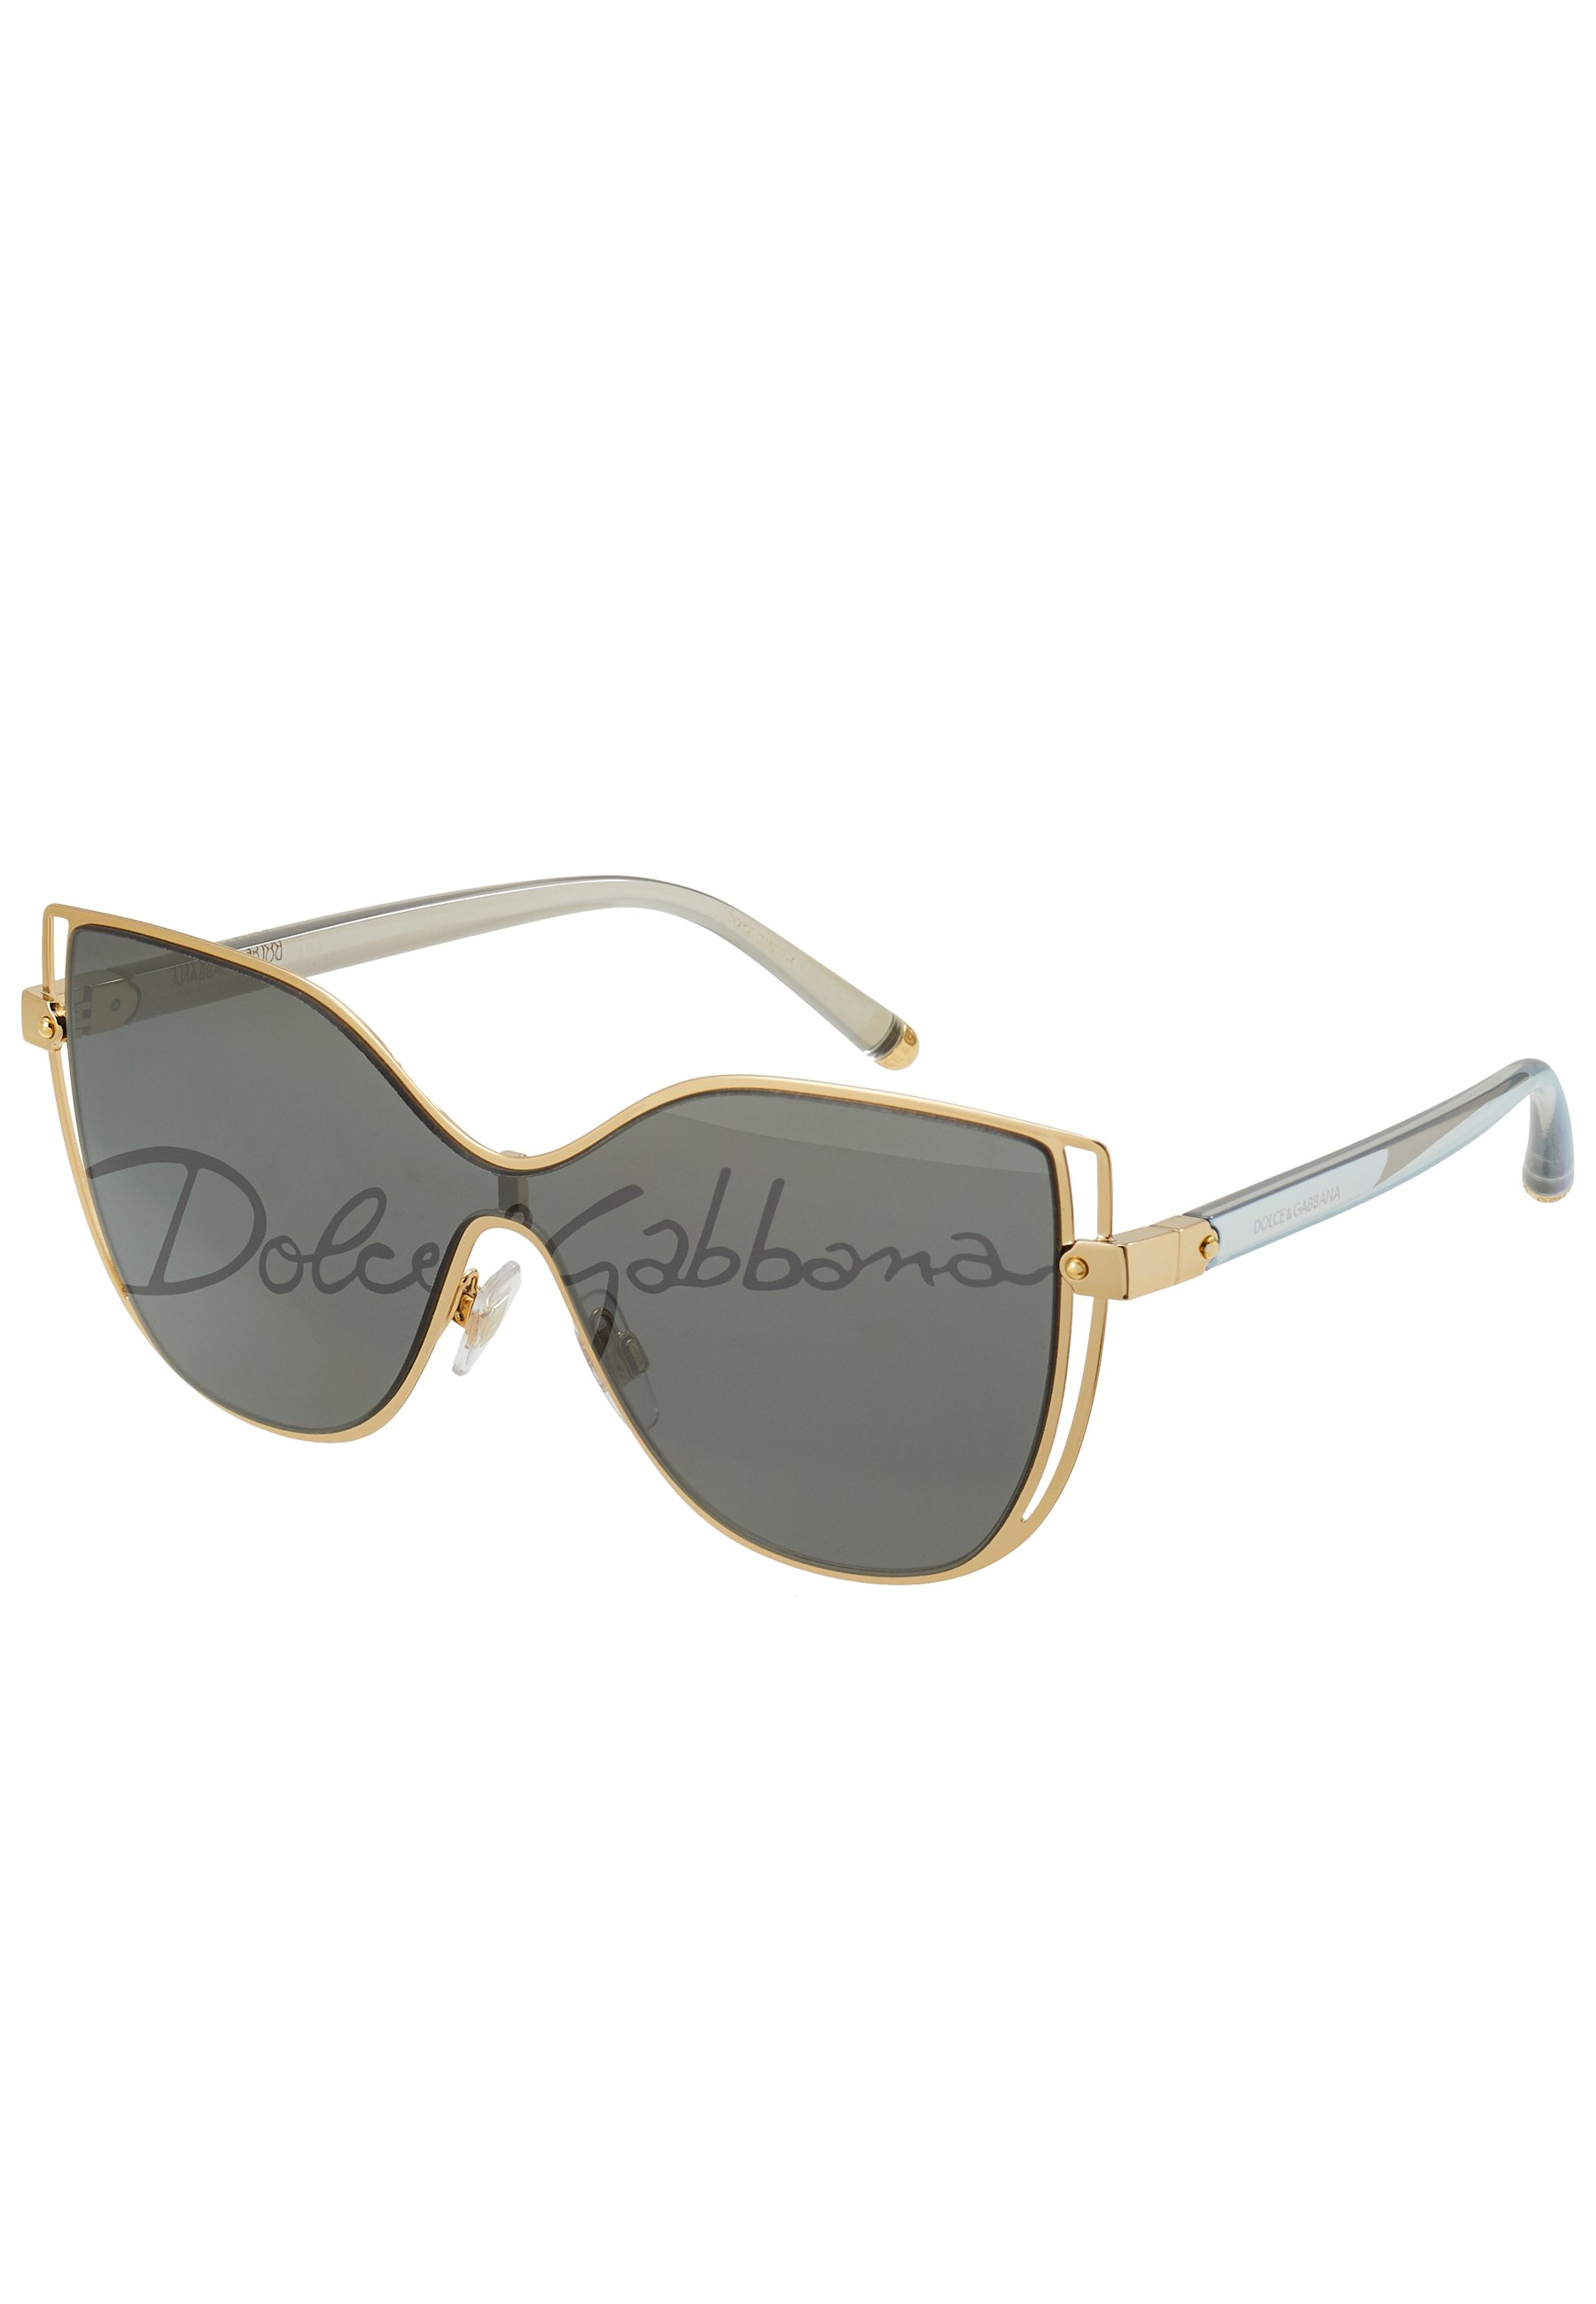 Dolce&Gabbana Solbriller - gold-coloured/gull dQ5JxafxCFtNlpx